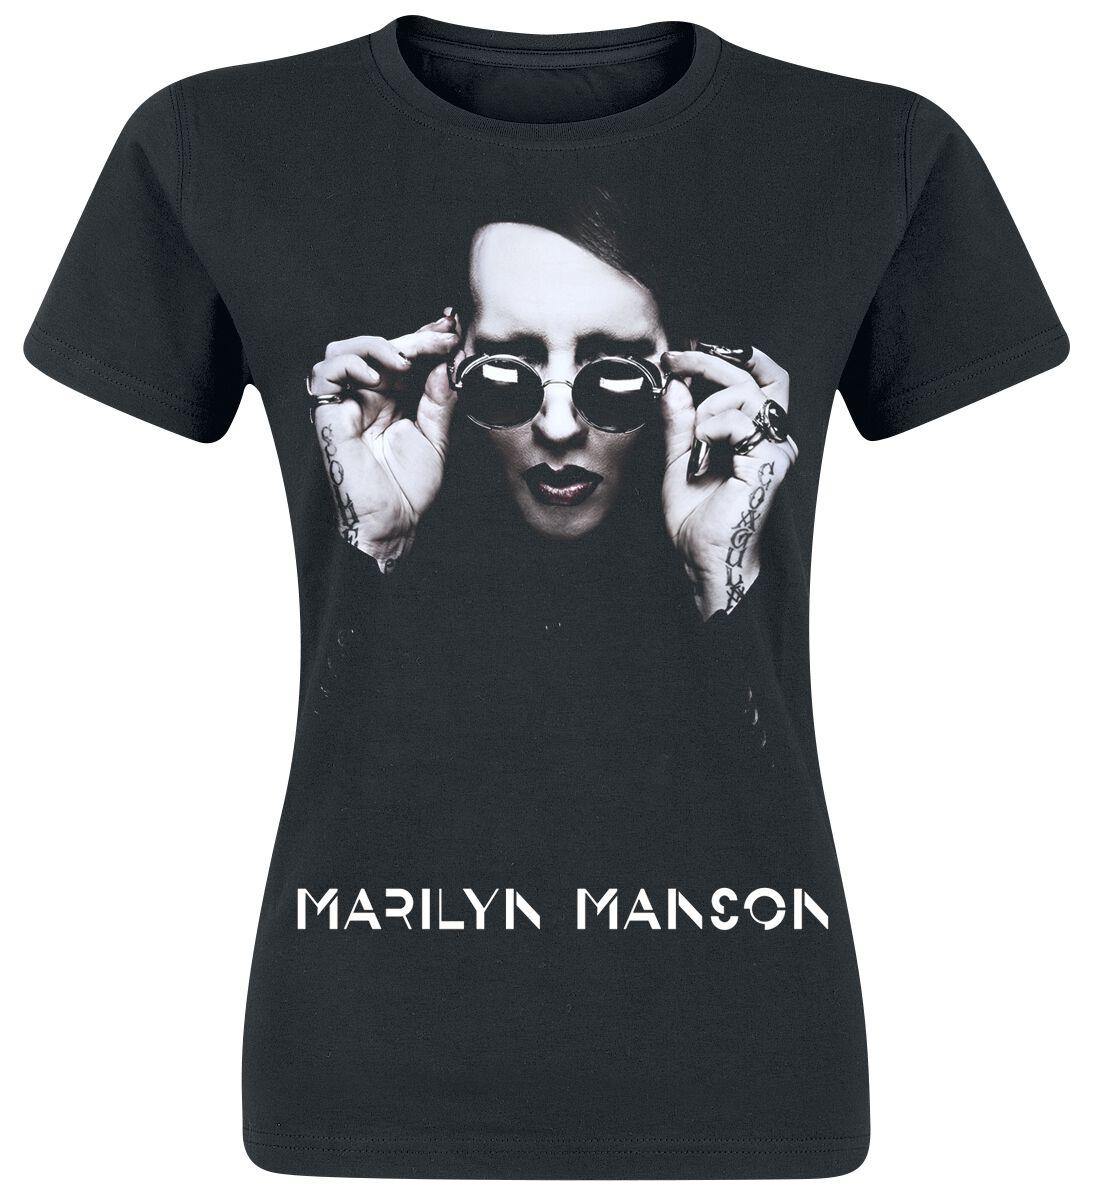 Zespoły - Koszulki - Koszulka damska Marilyn Manson Specks Koszulka damska czarny - 315916